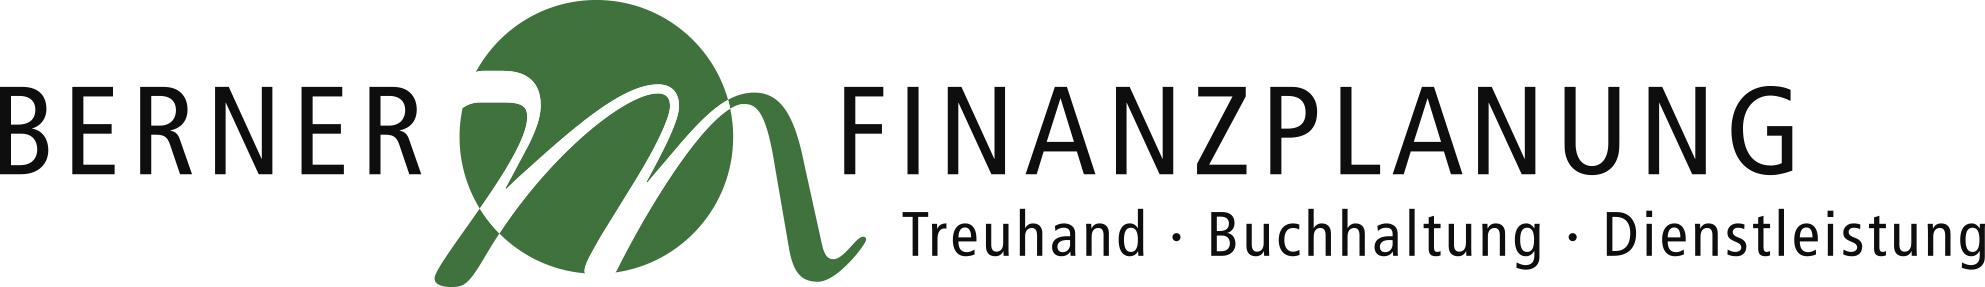 Bilder Berner Finanzplanung GmbH